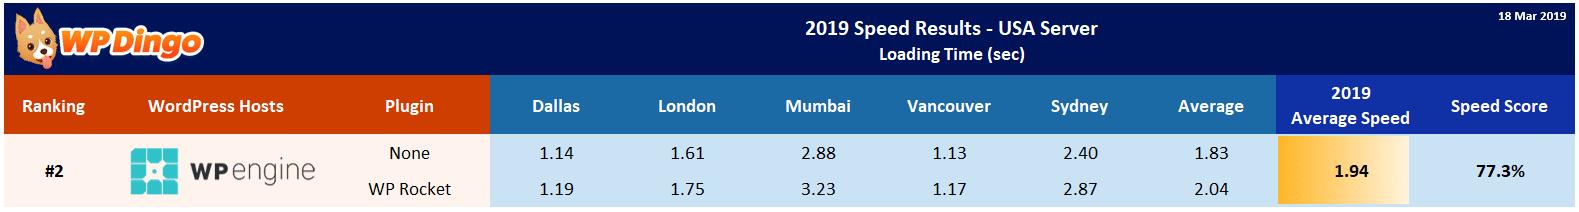 2019 WP Engine Speed Table - USA Server